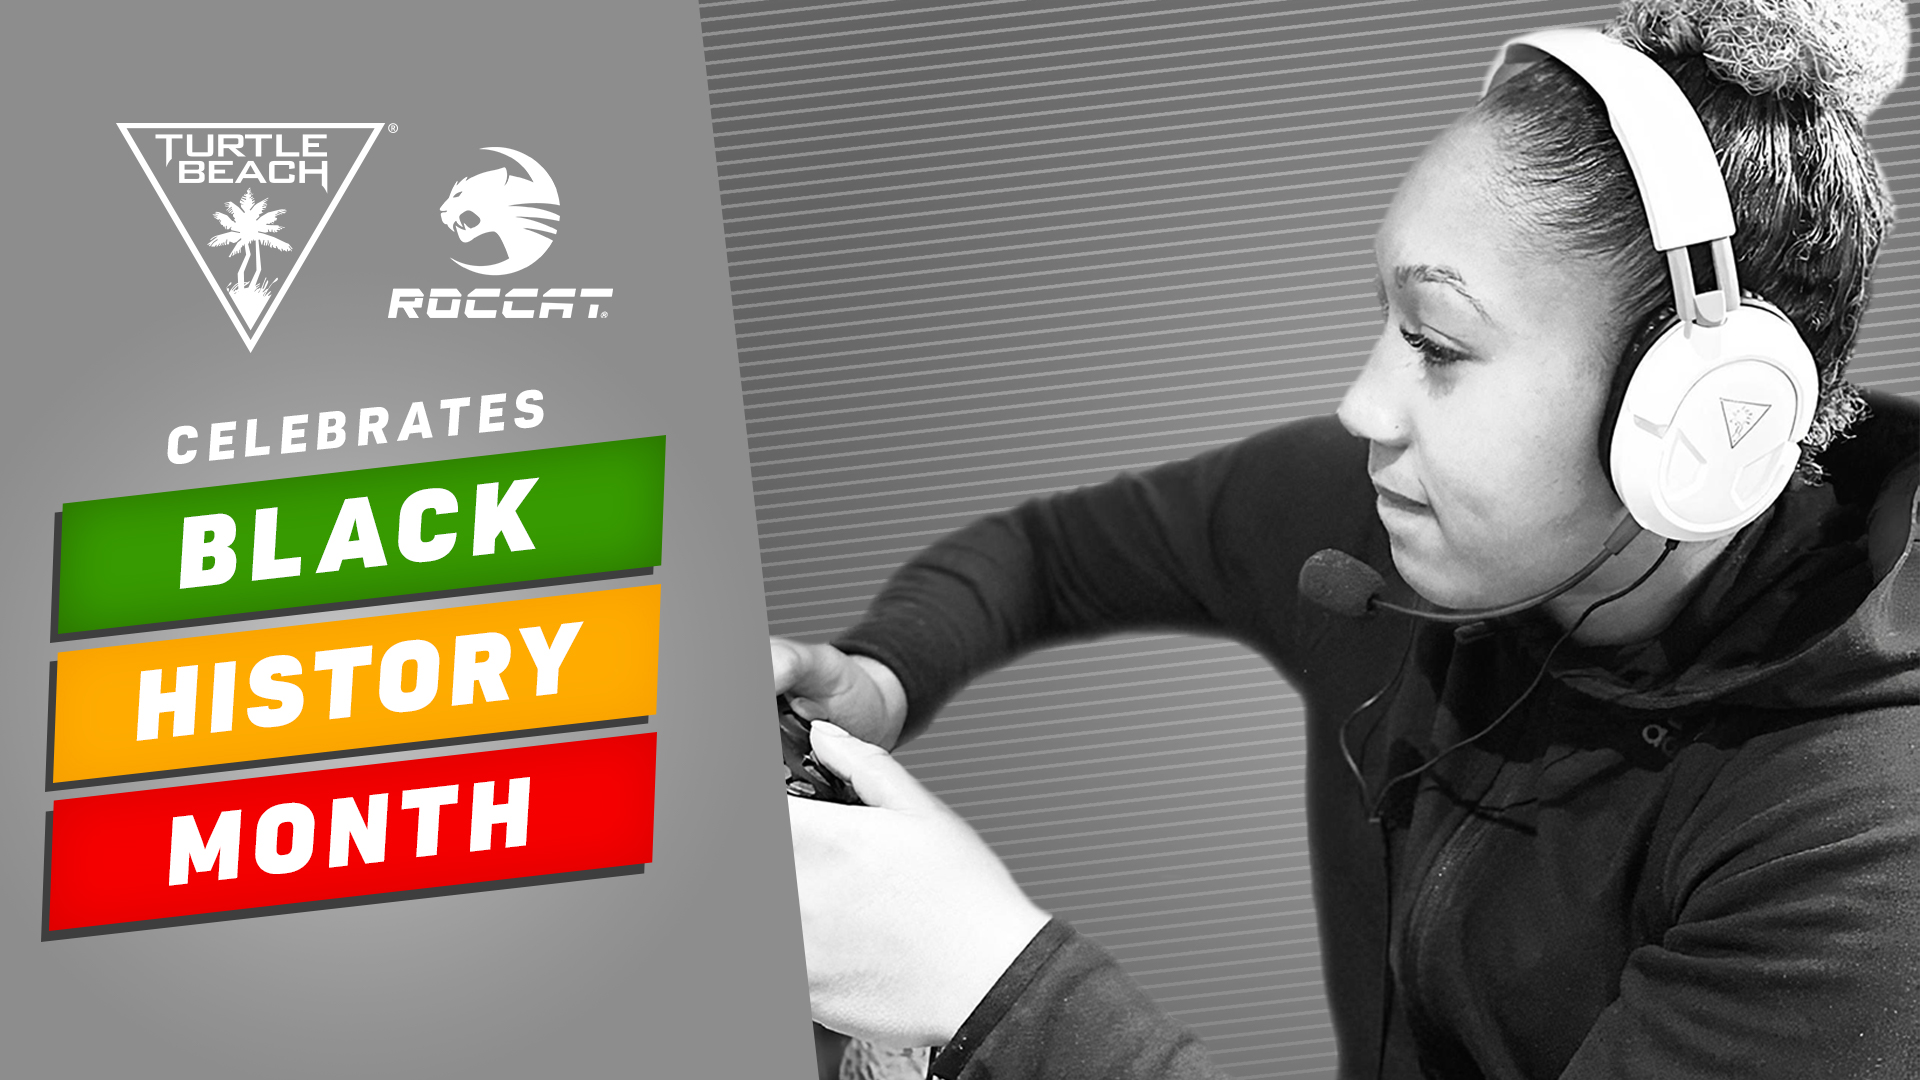 Celebrating Black History Month: A Conversation With Lauren James